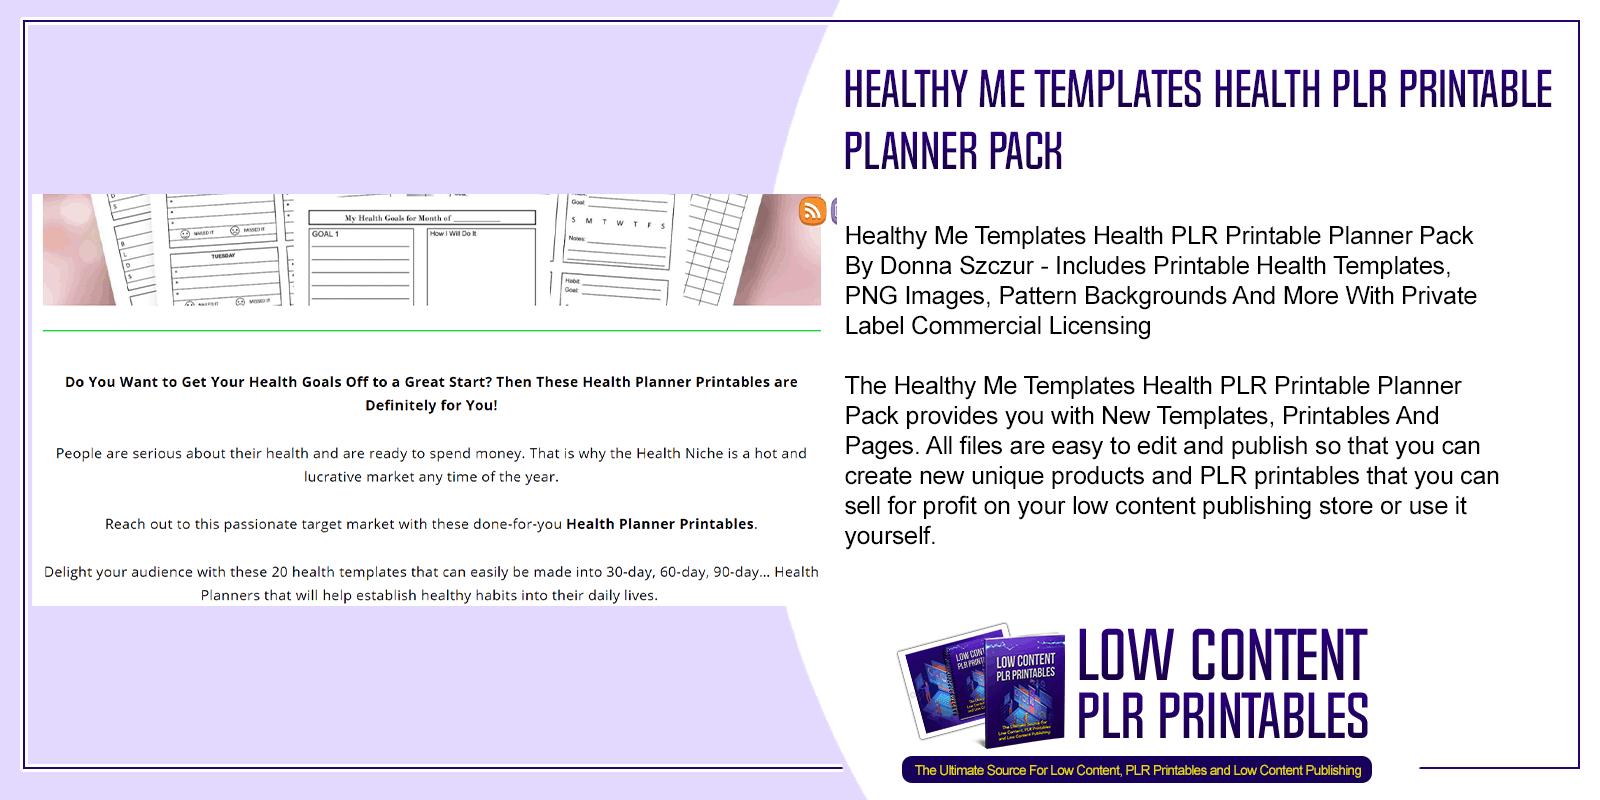 Healthy Me Templates Health PLR Printable Planner Pack